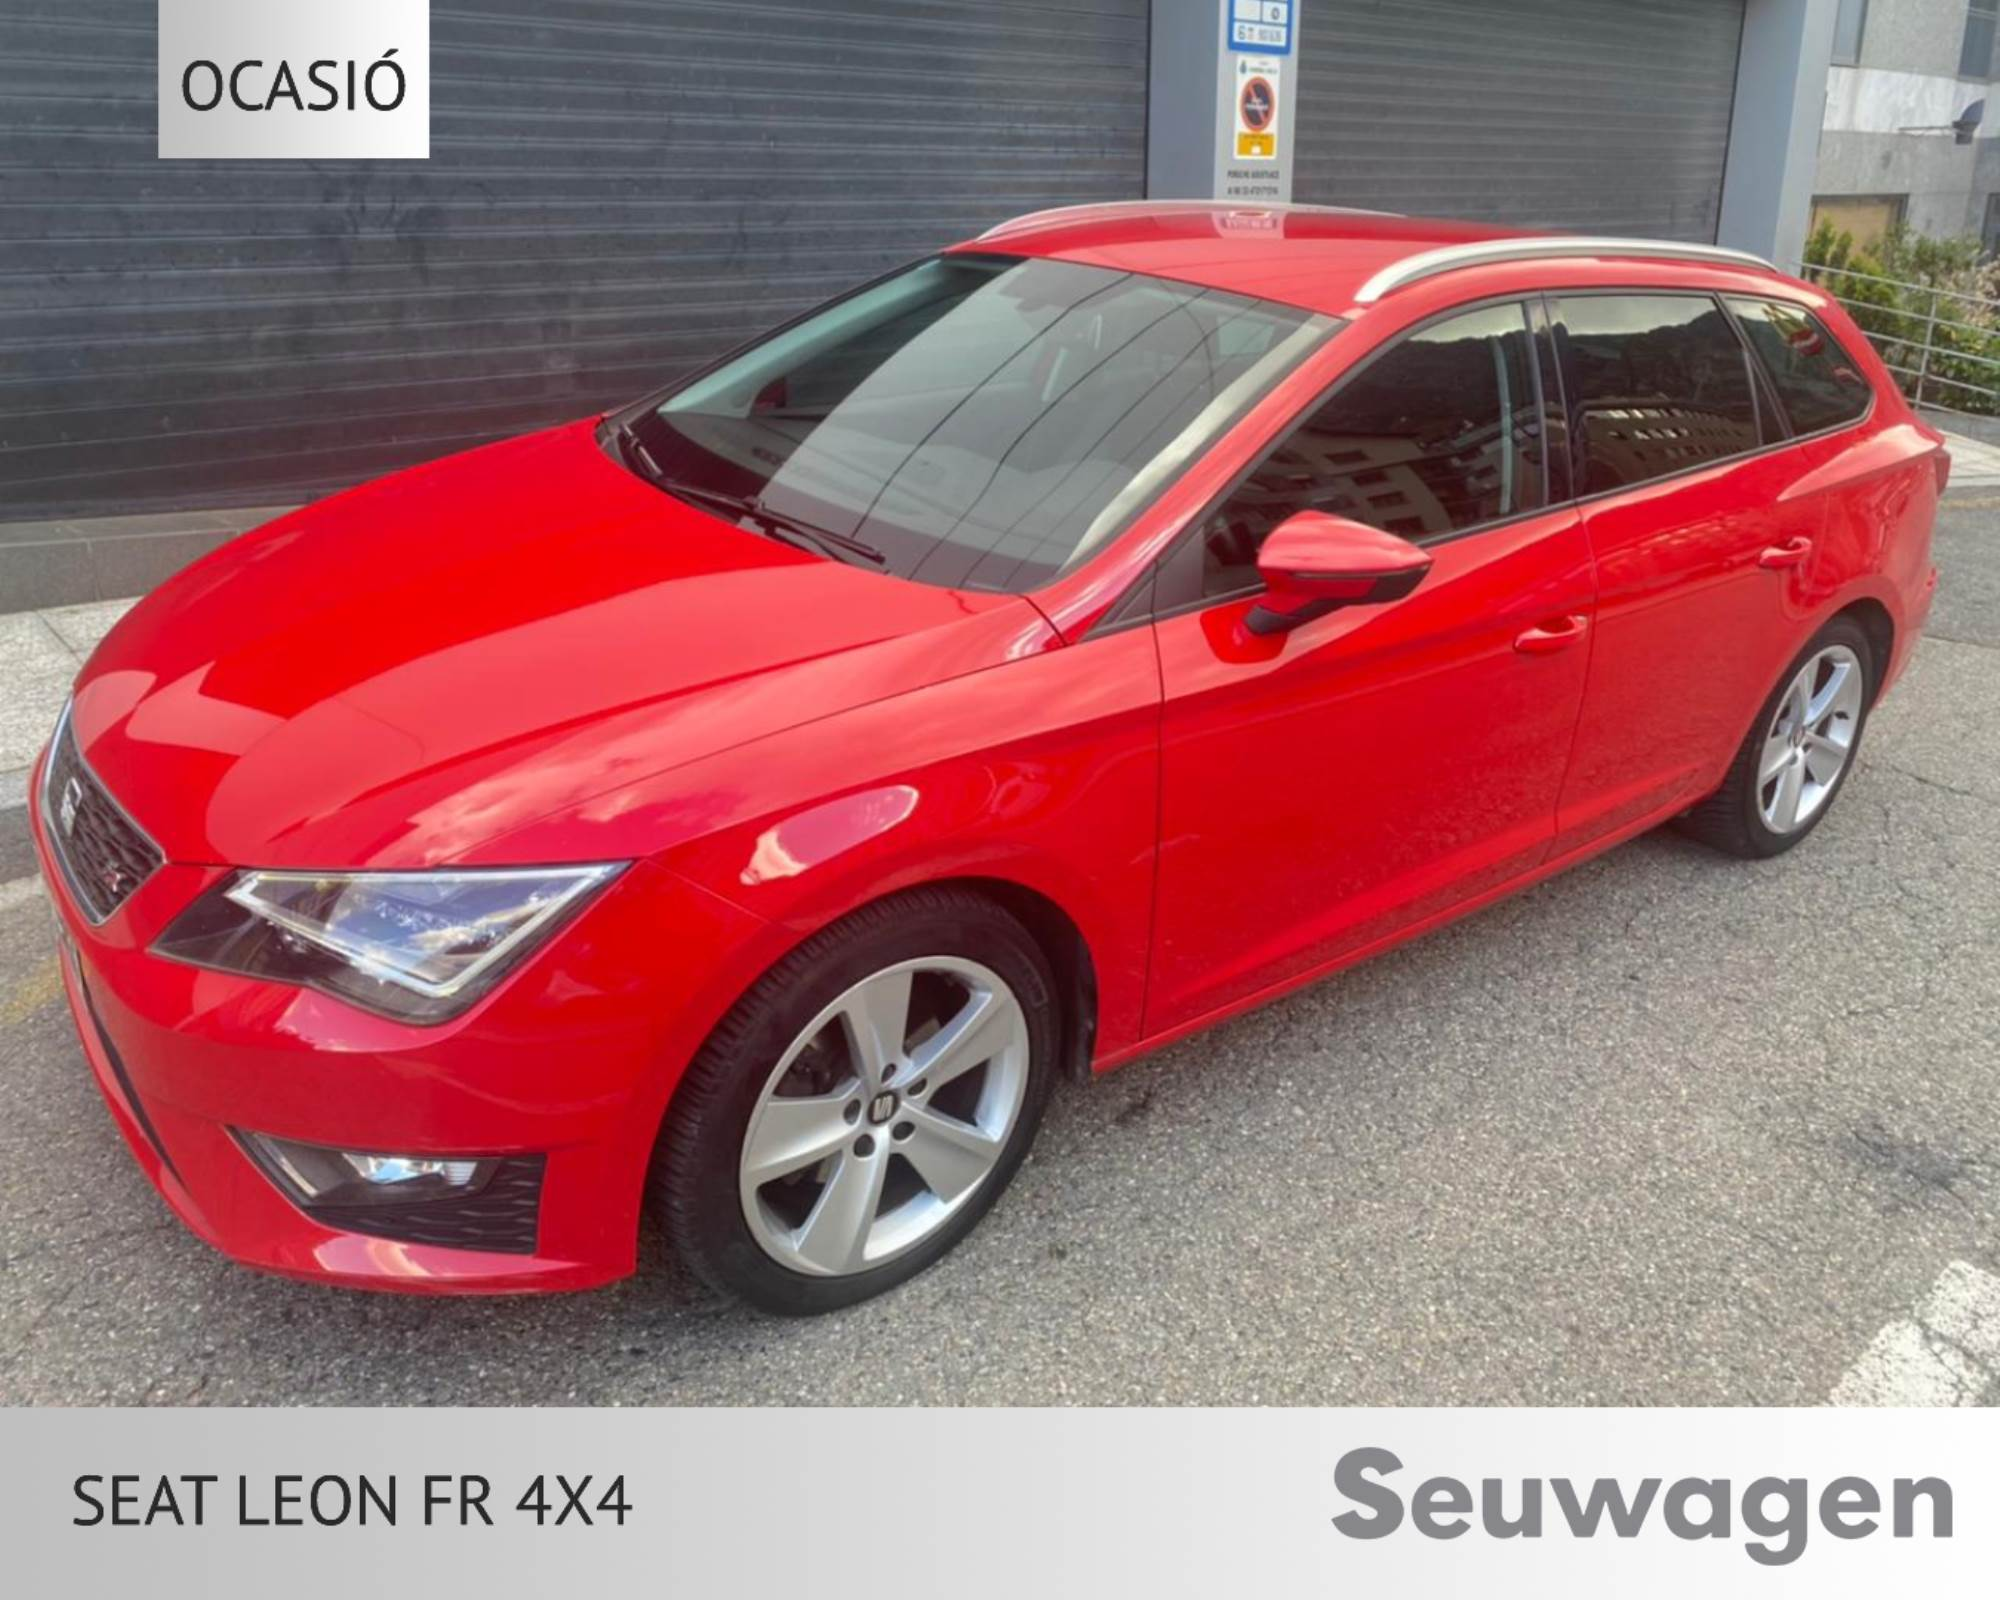 Seat - Leon - FR ST4 2.0 TDI CR 150CV FR ST4 2.0 TDI CR 150CV Dièsel  2015  120.000 Km